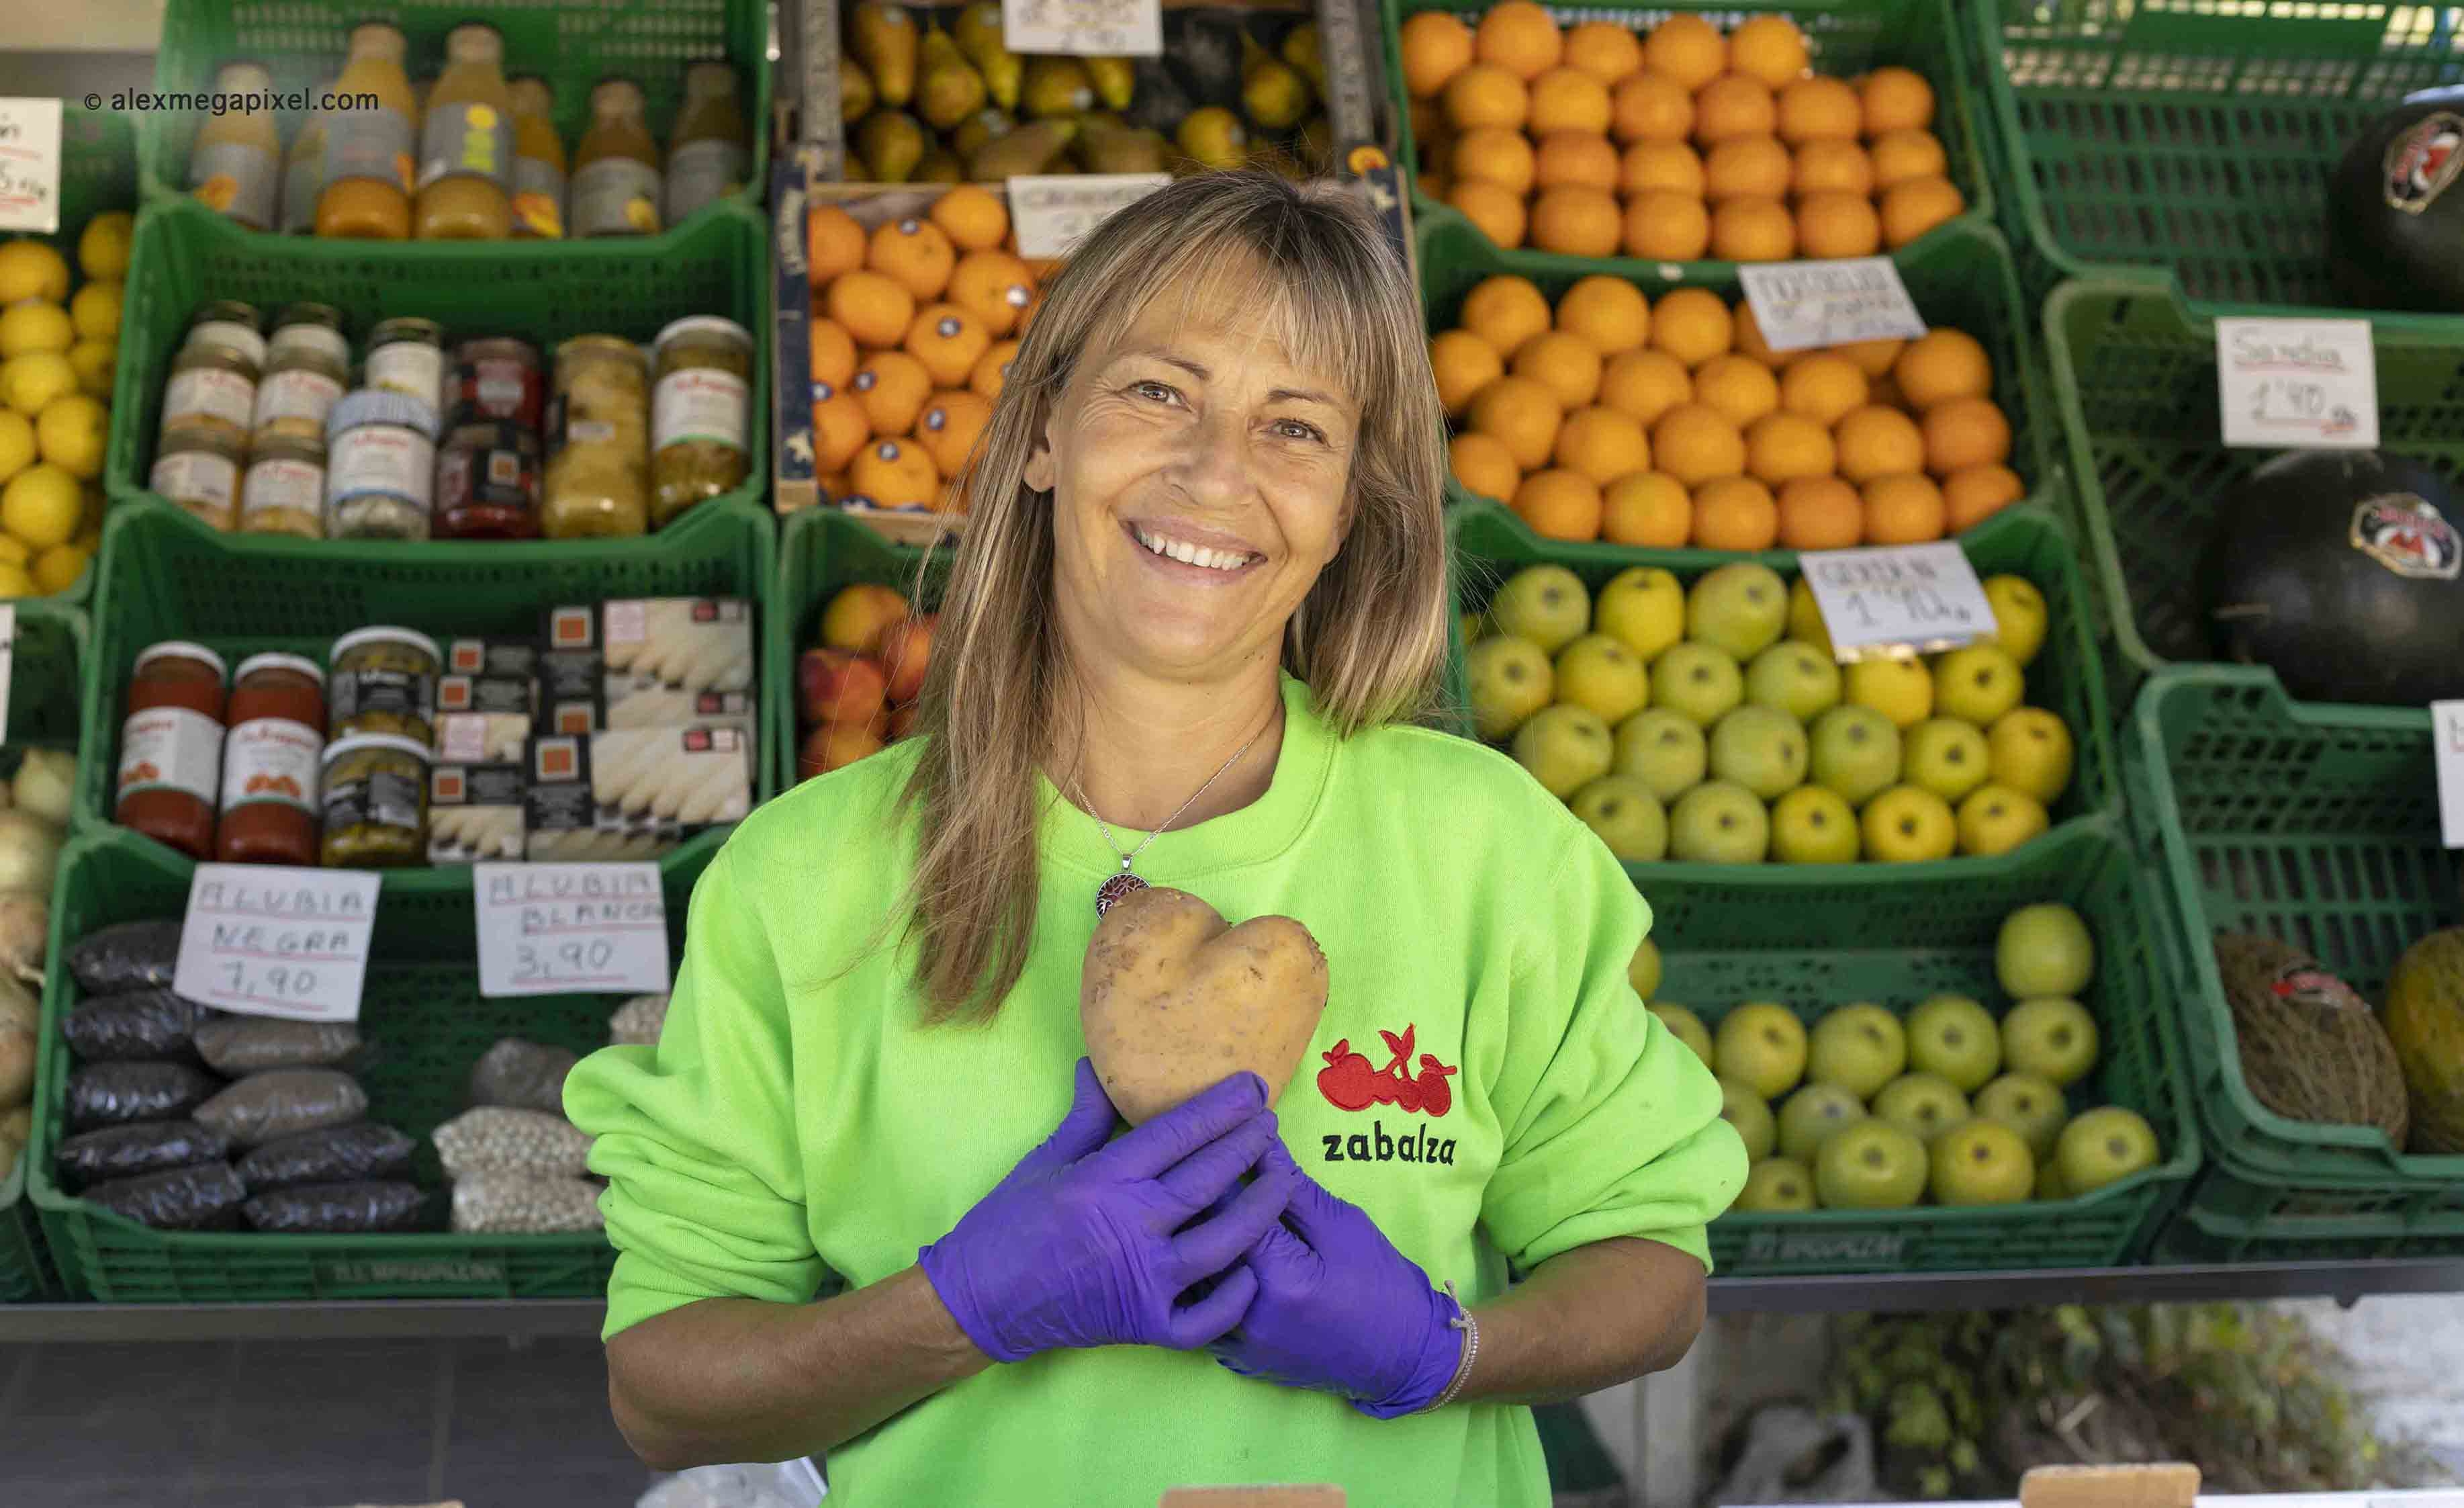 Frutas y verduras Zabalza